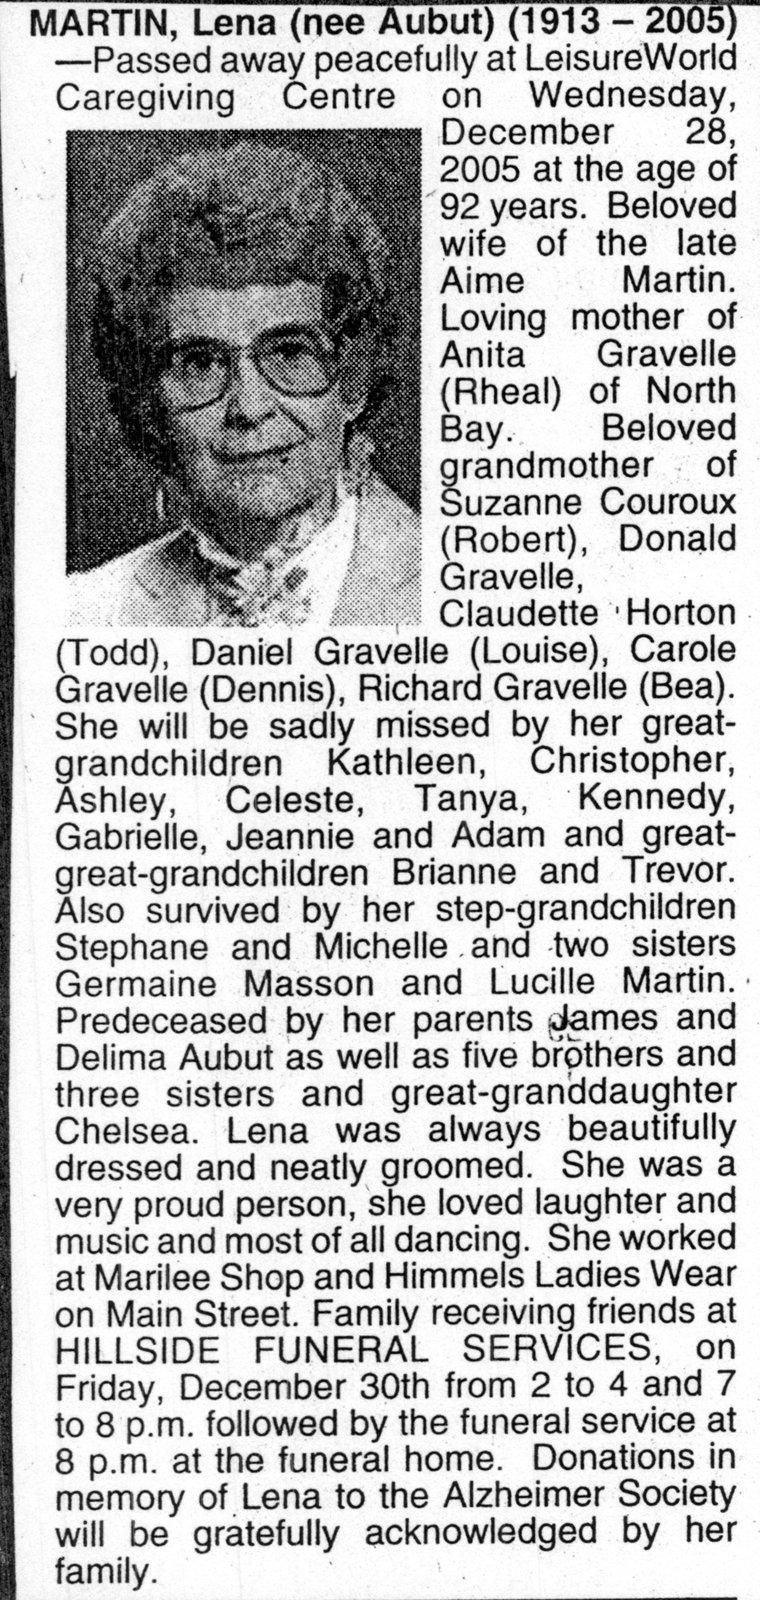 Nécrologie / Obituary Lena Martin (née Aubut)